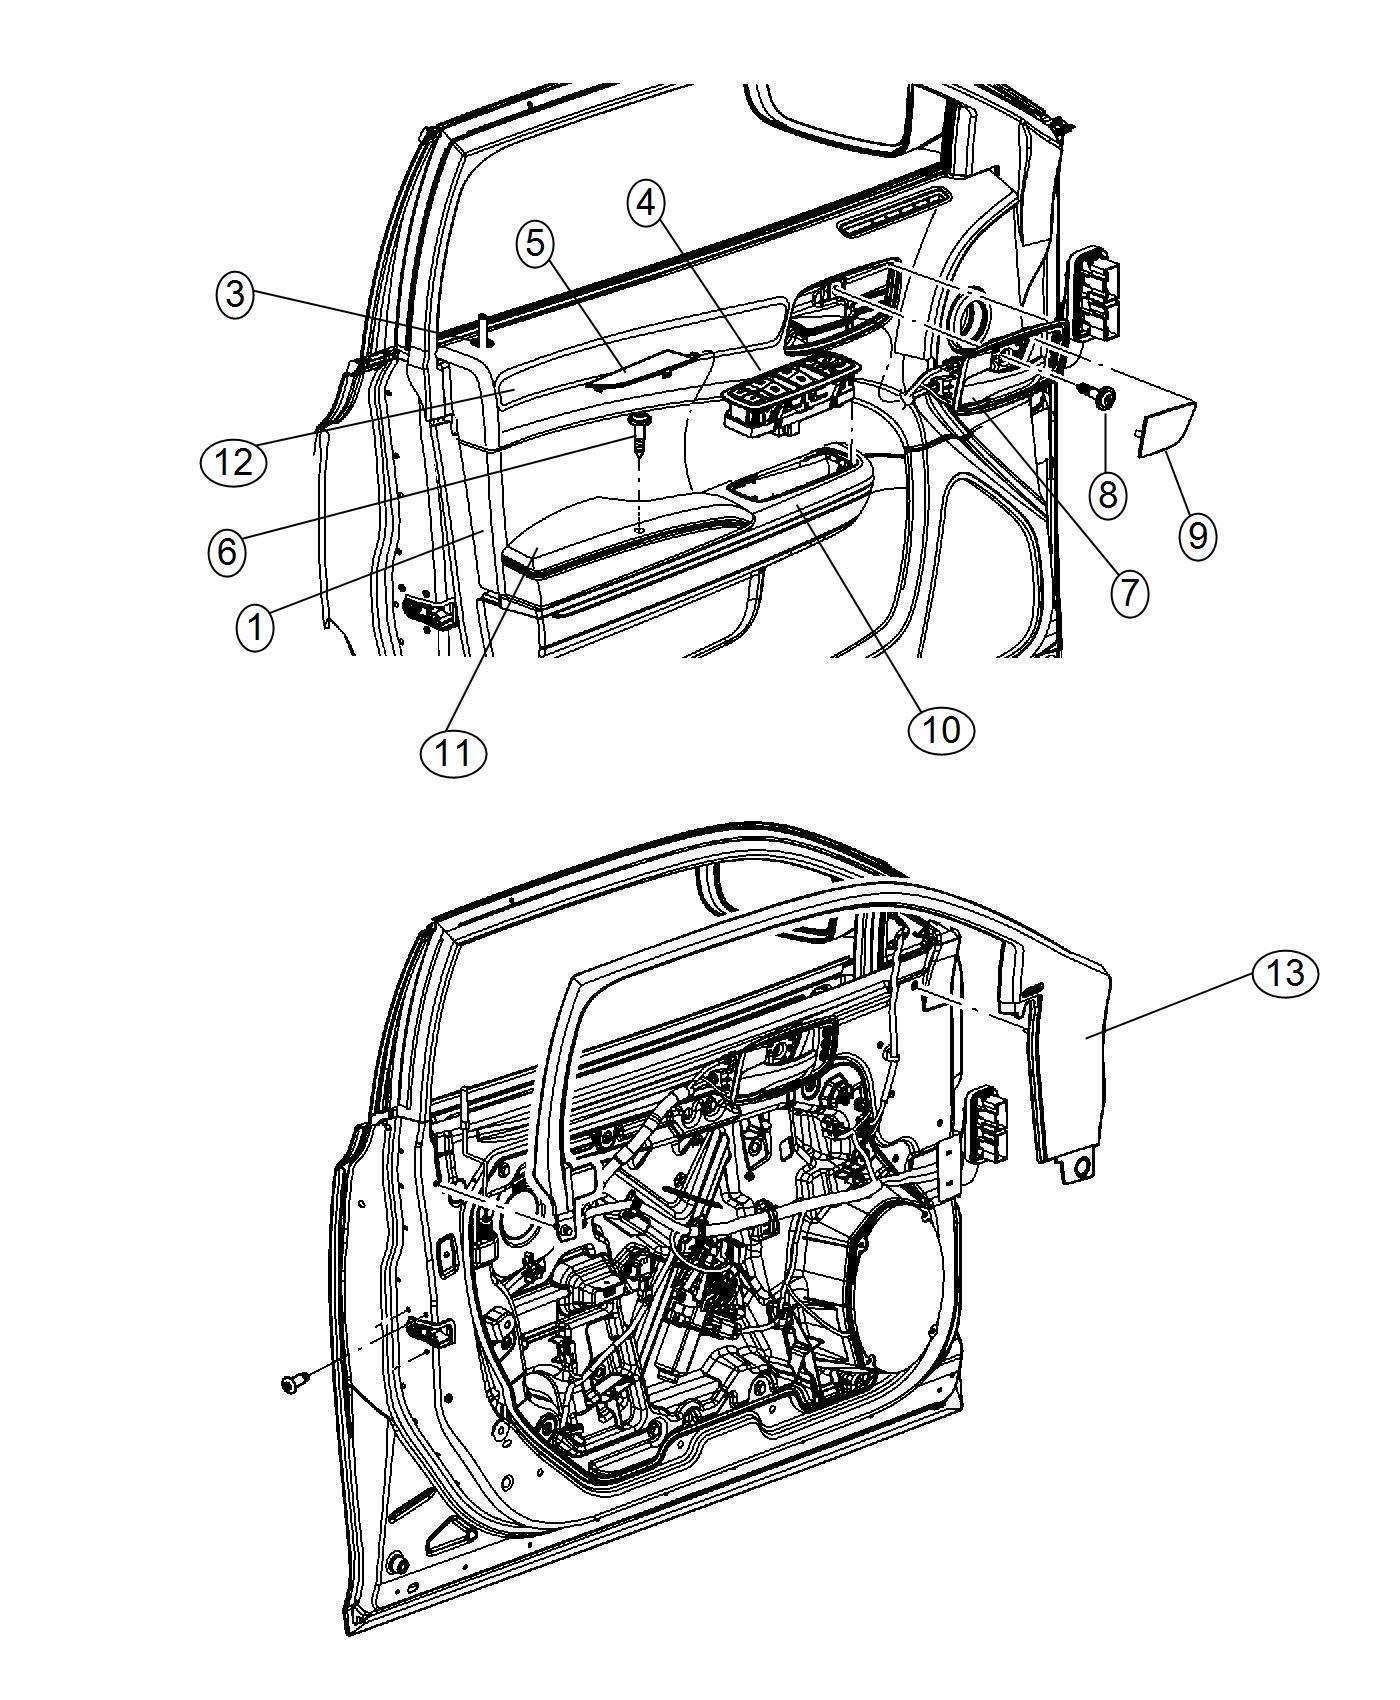 chrysler 300 trim parts diagram